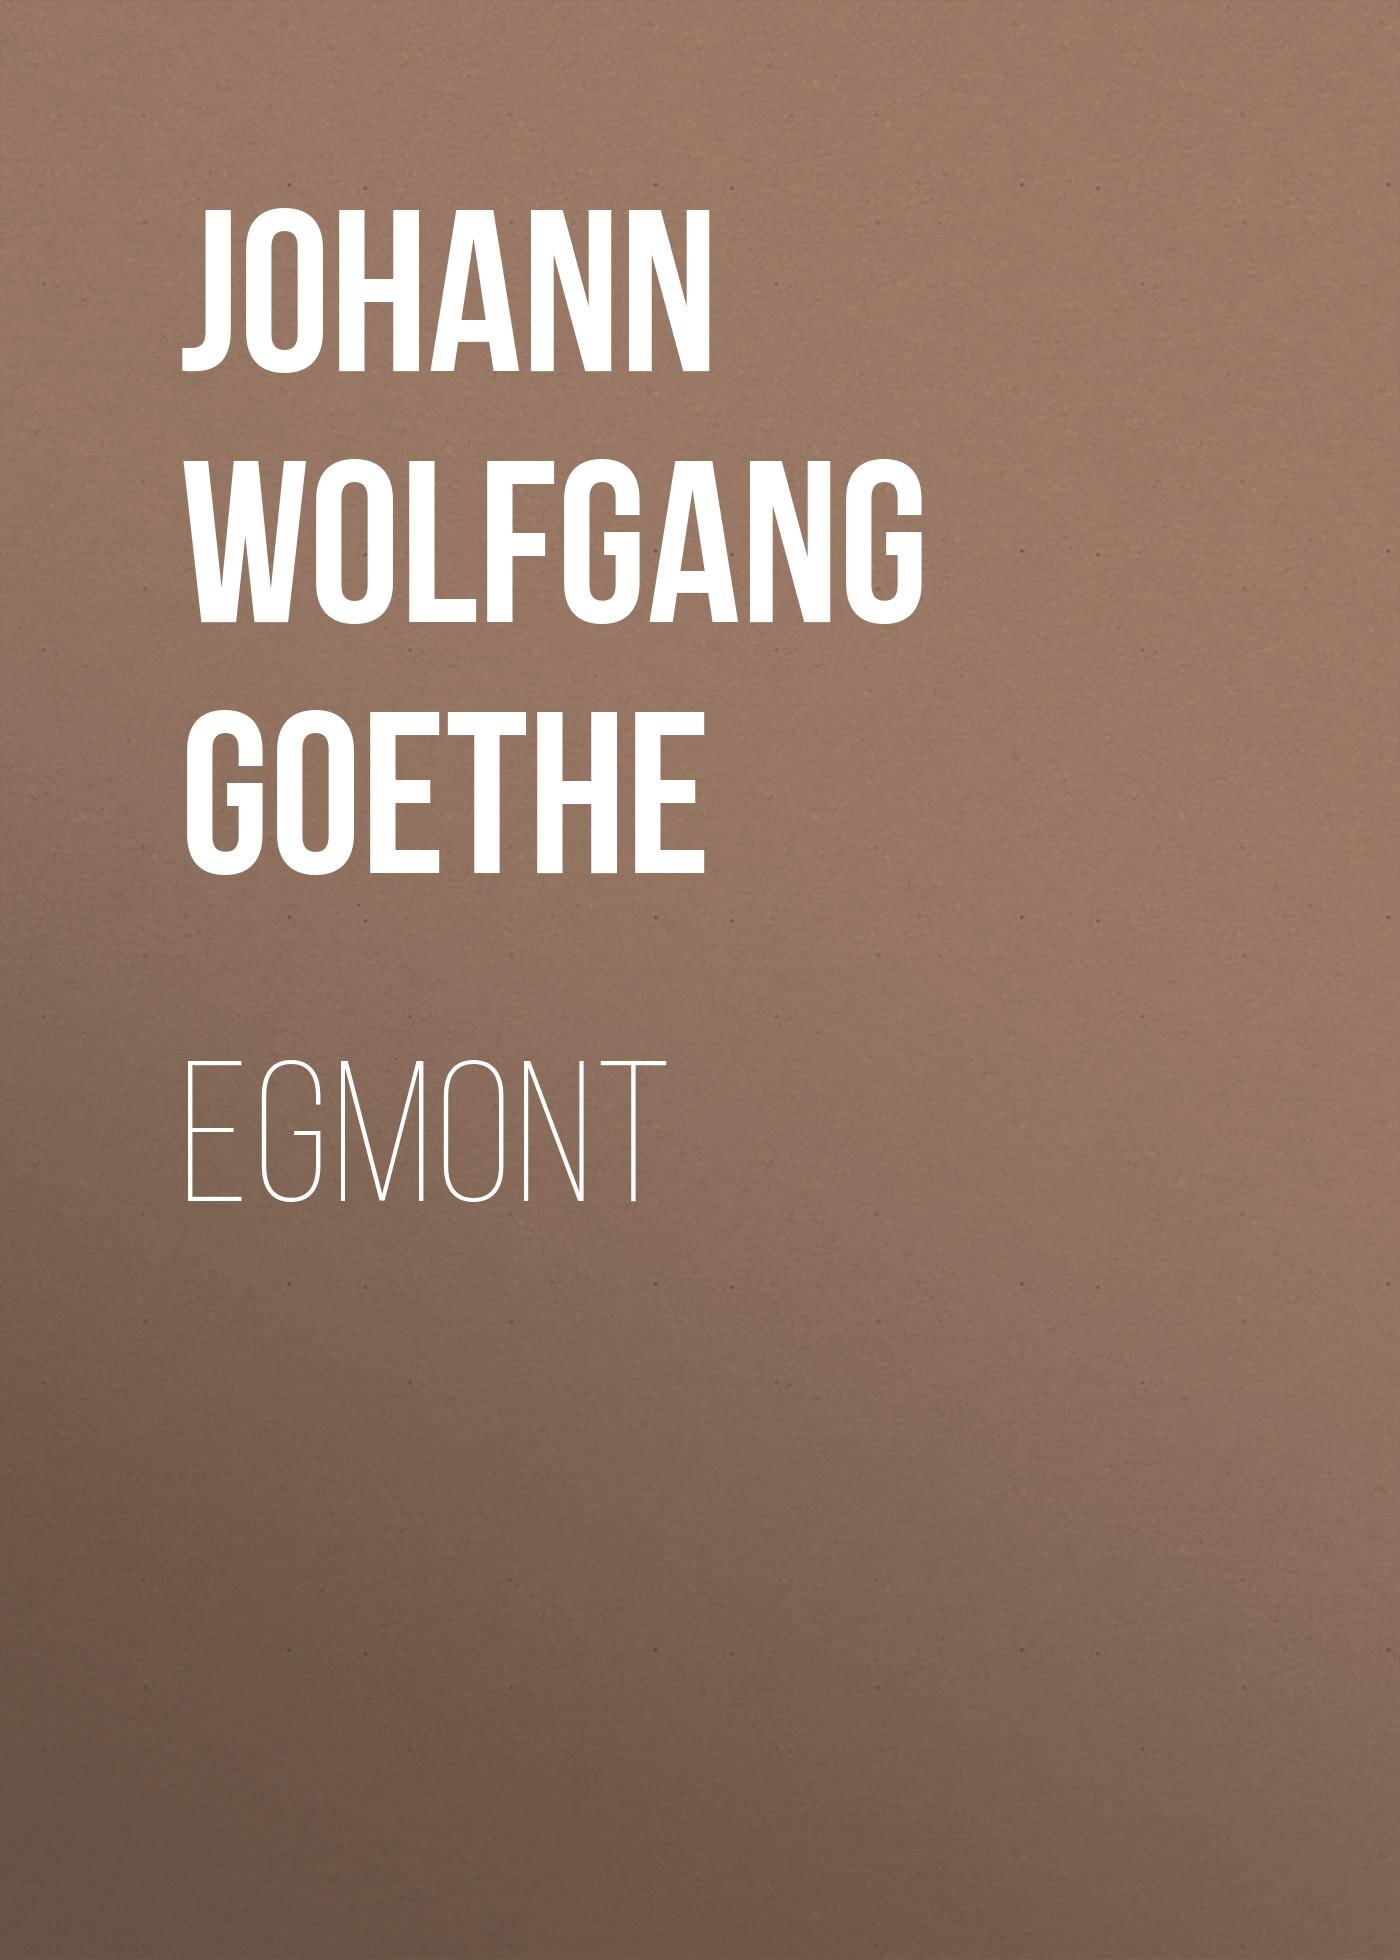 Иоганн Вольфганг фон Гёте Egmont иоганн вольфганг фон гёте die aufgeregten